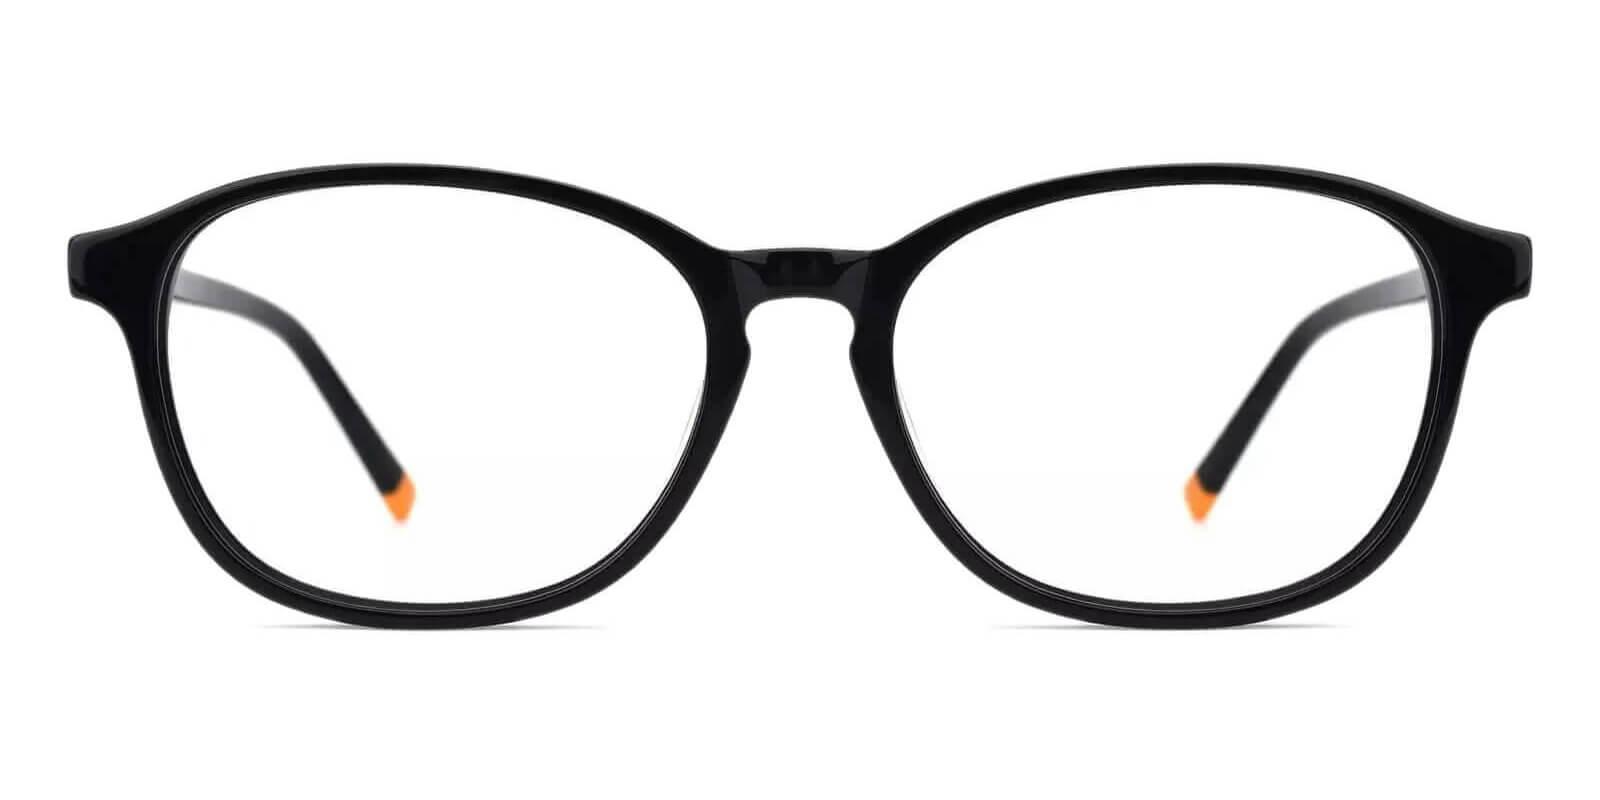 Fogelsville Black Acetate Eyeglasses , SpringHinges , UniversalBridgeFit Frames from ABBE Glasses